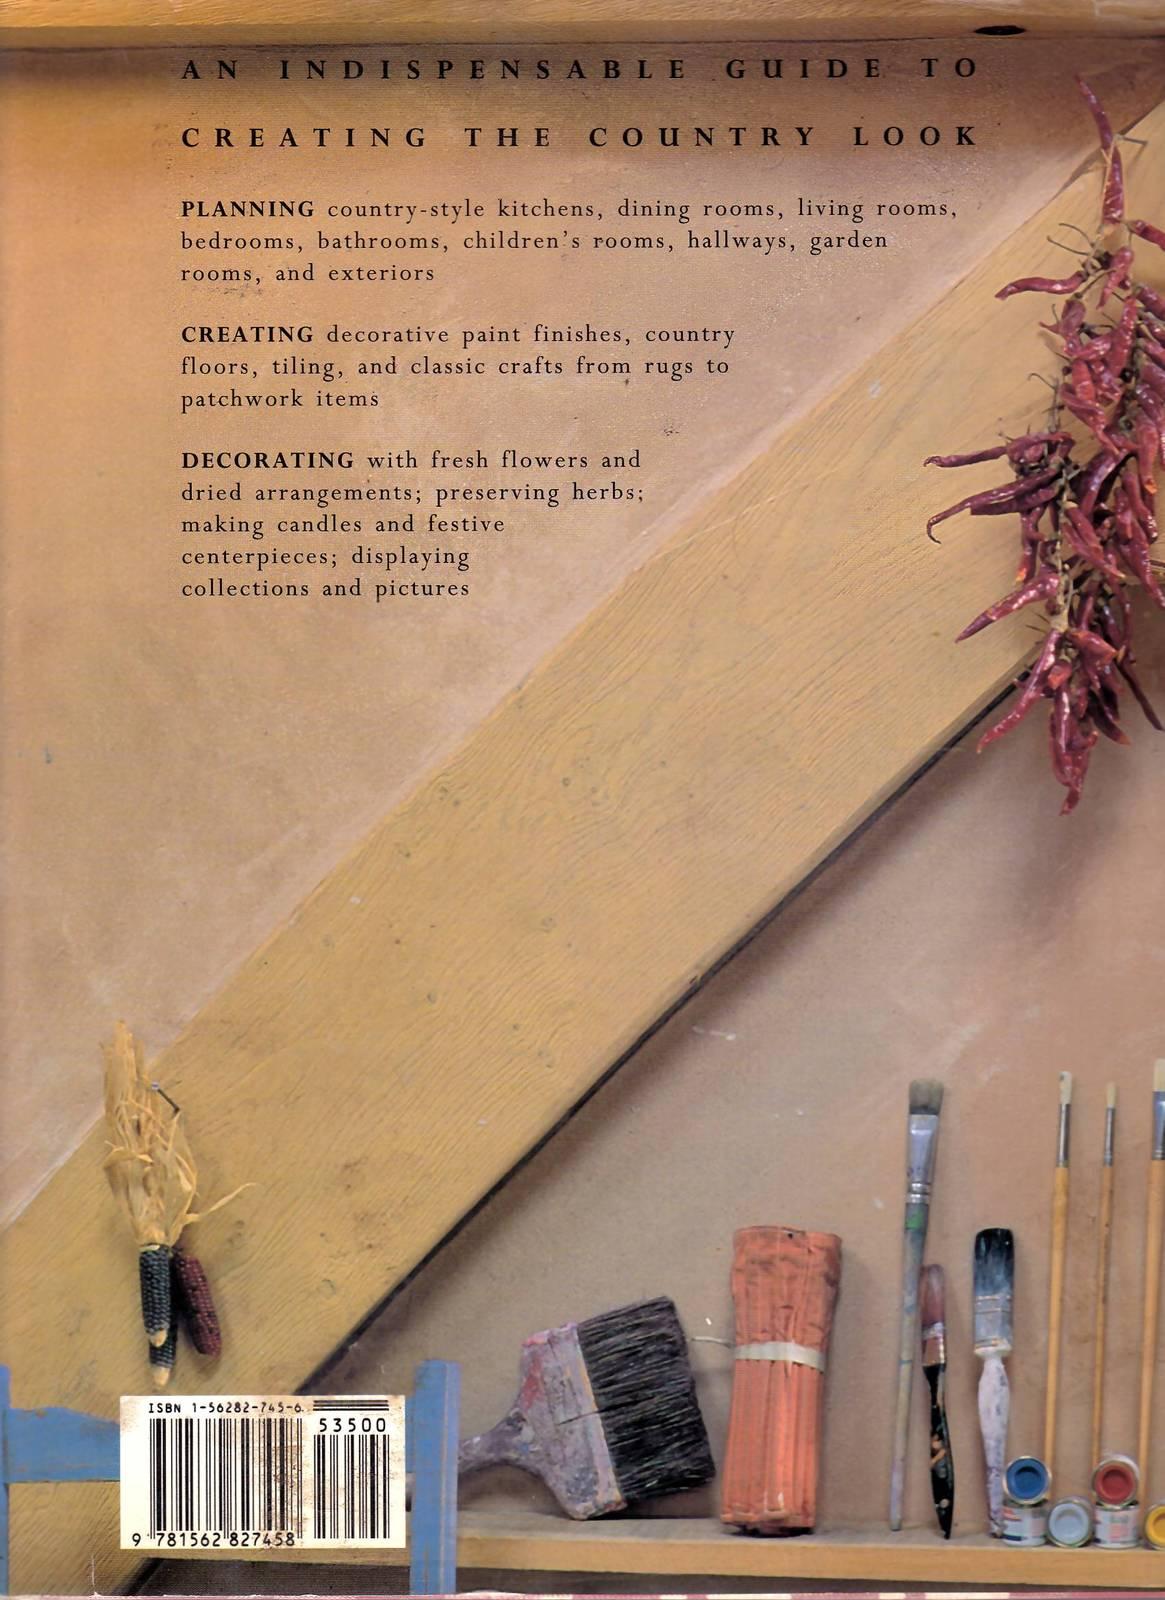 Laural Ashley British Interior Designer LTD Collectible Home Decor Book